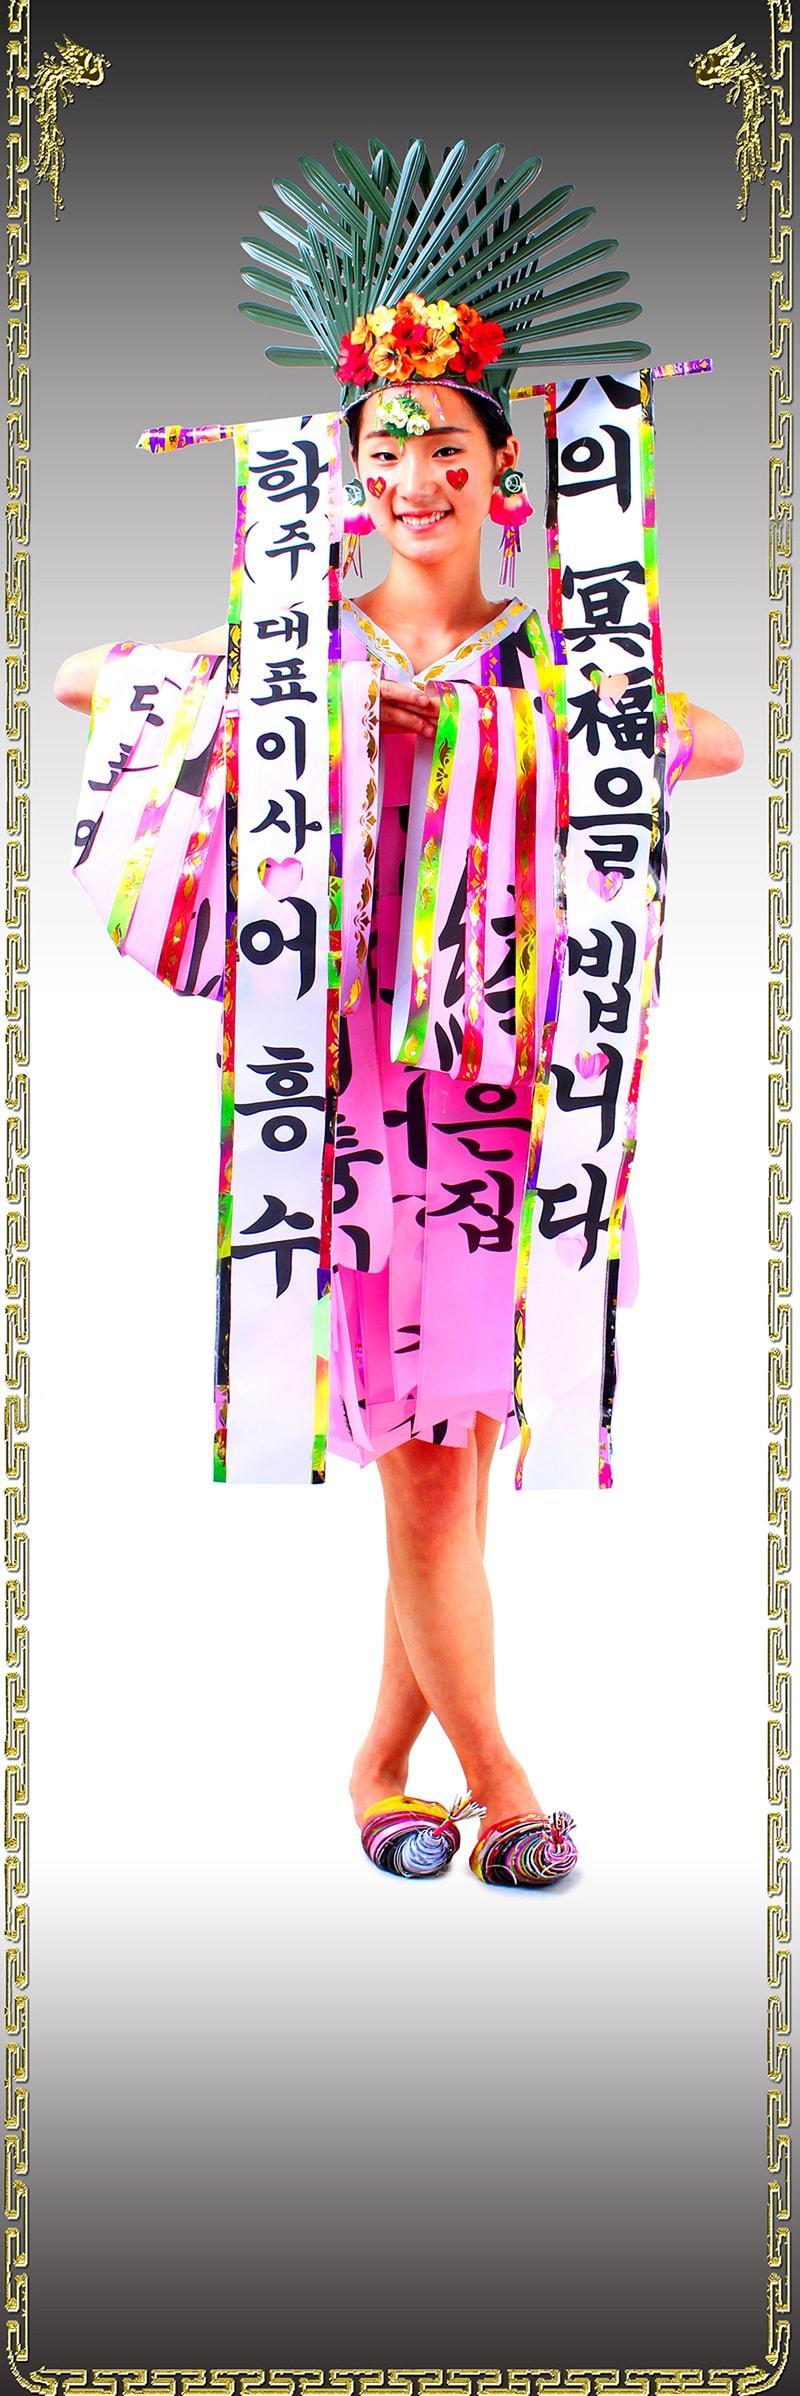 GirlsclubAsia-Artist-SungsilRyu-2016-1